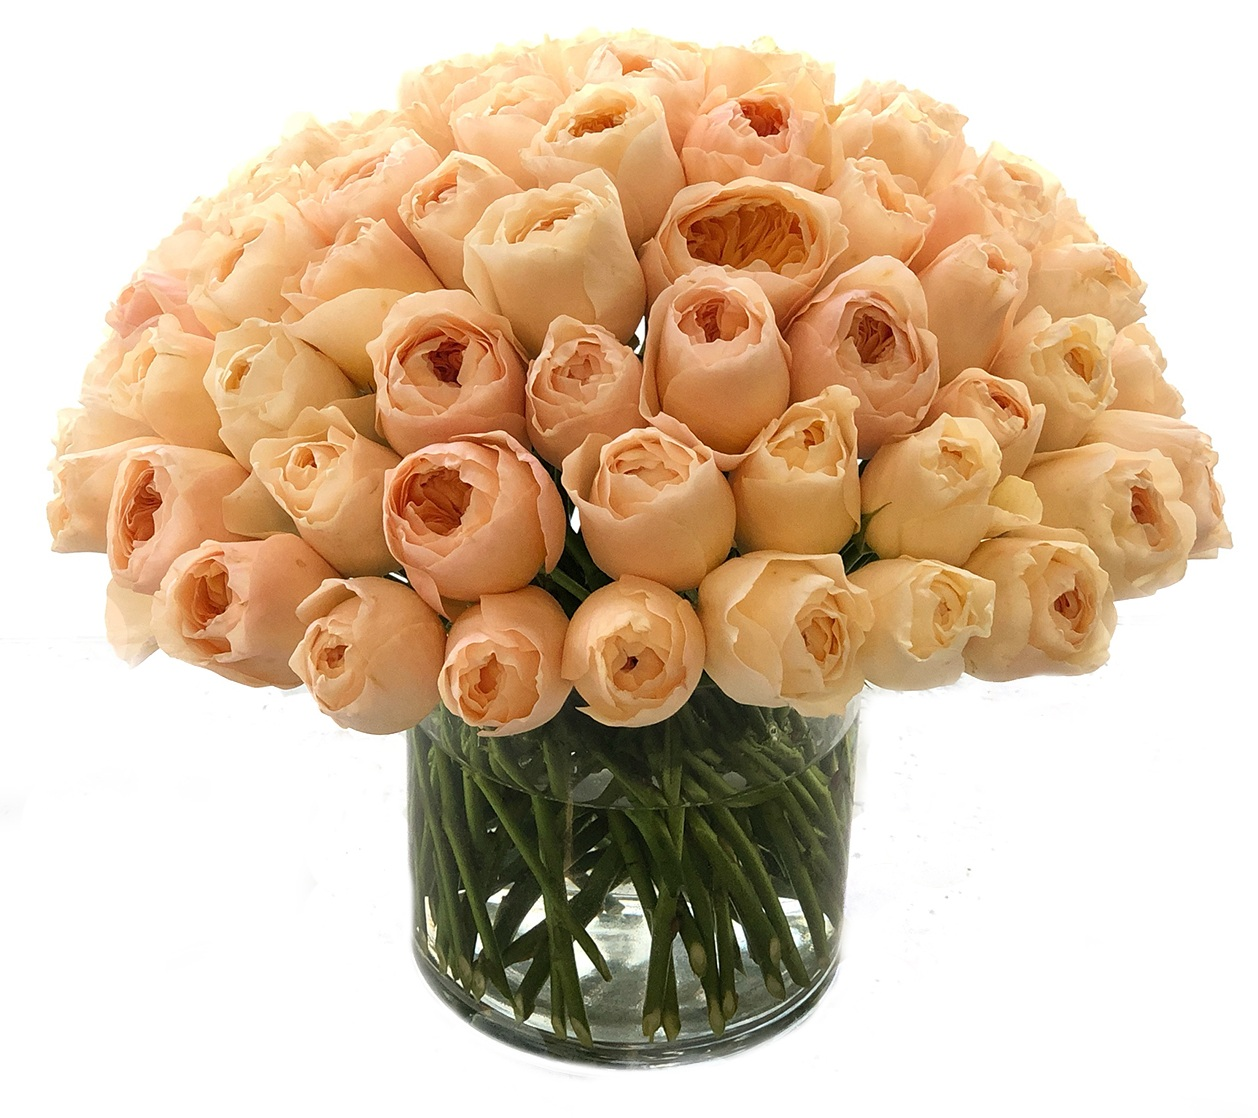 Apricot Garden Roses